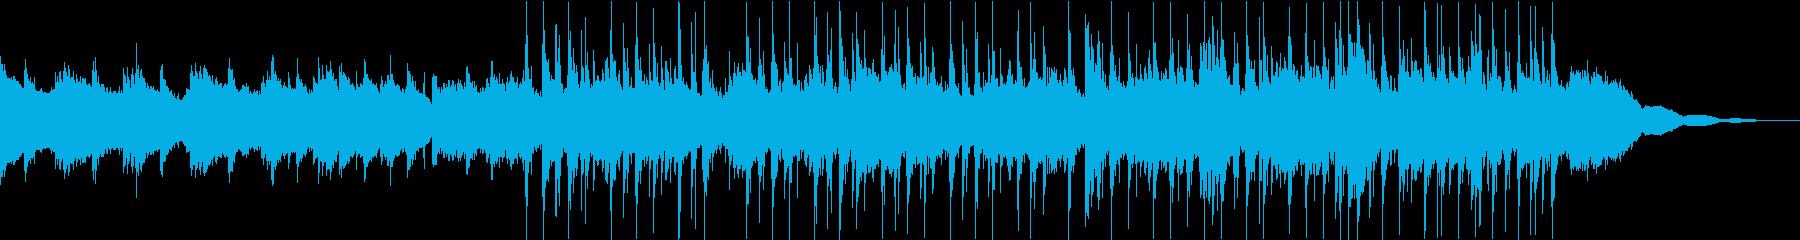 Pf「日差し」和風現代ジャズの再生済みの波形